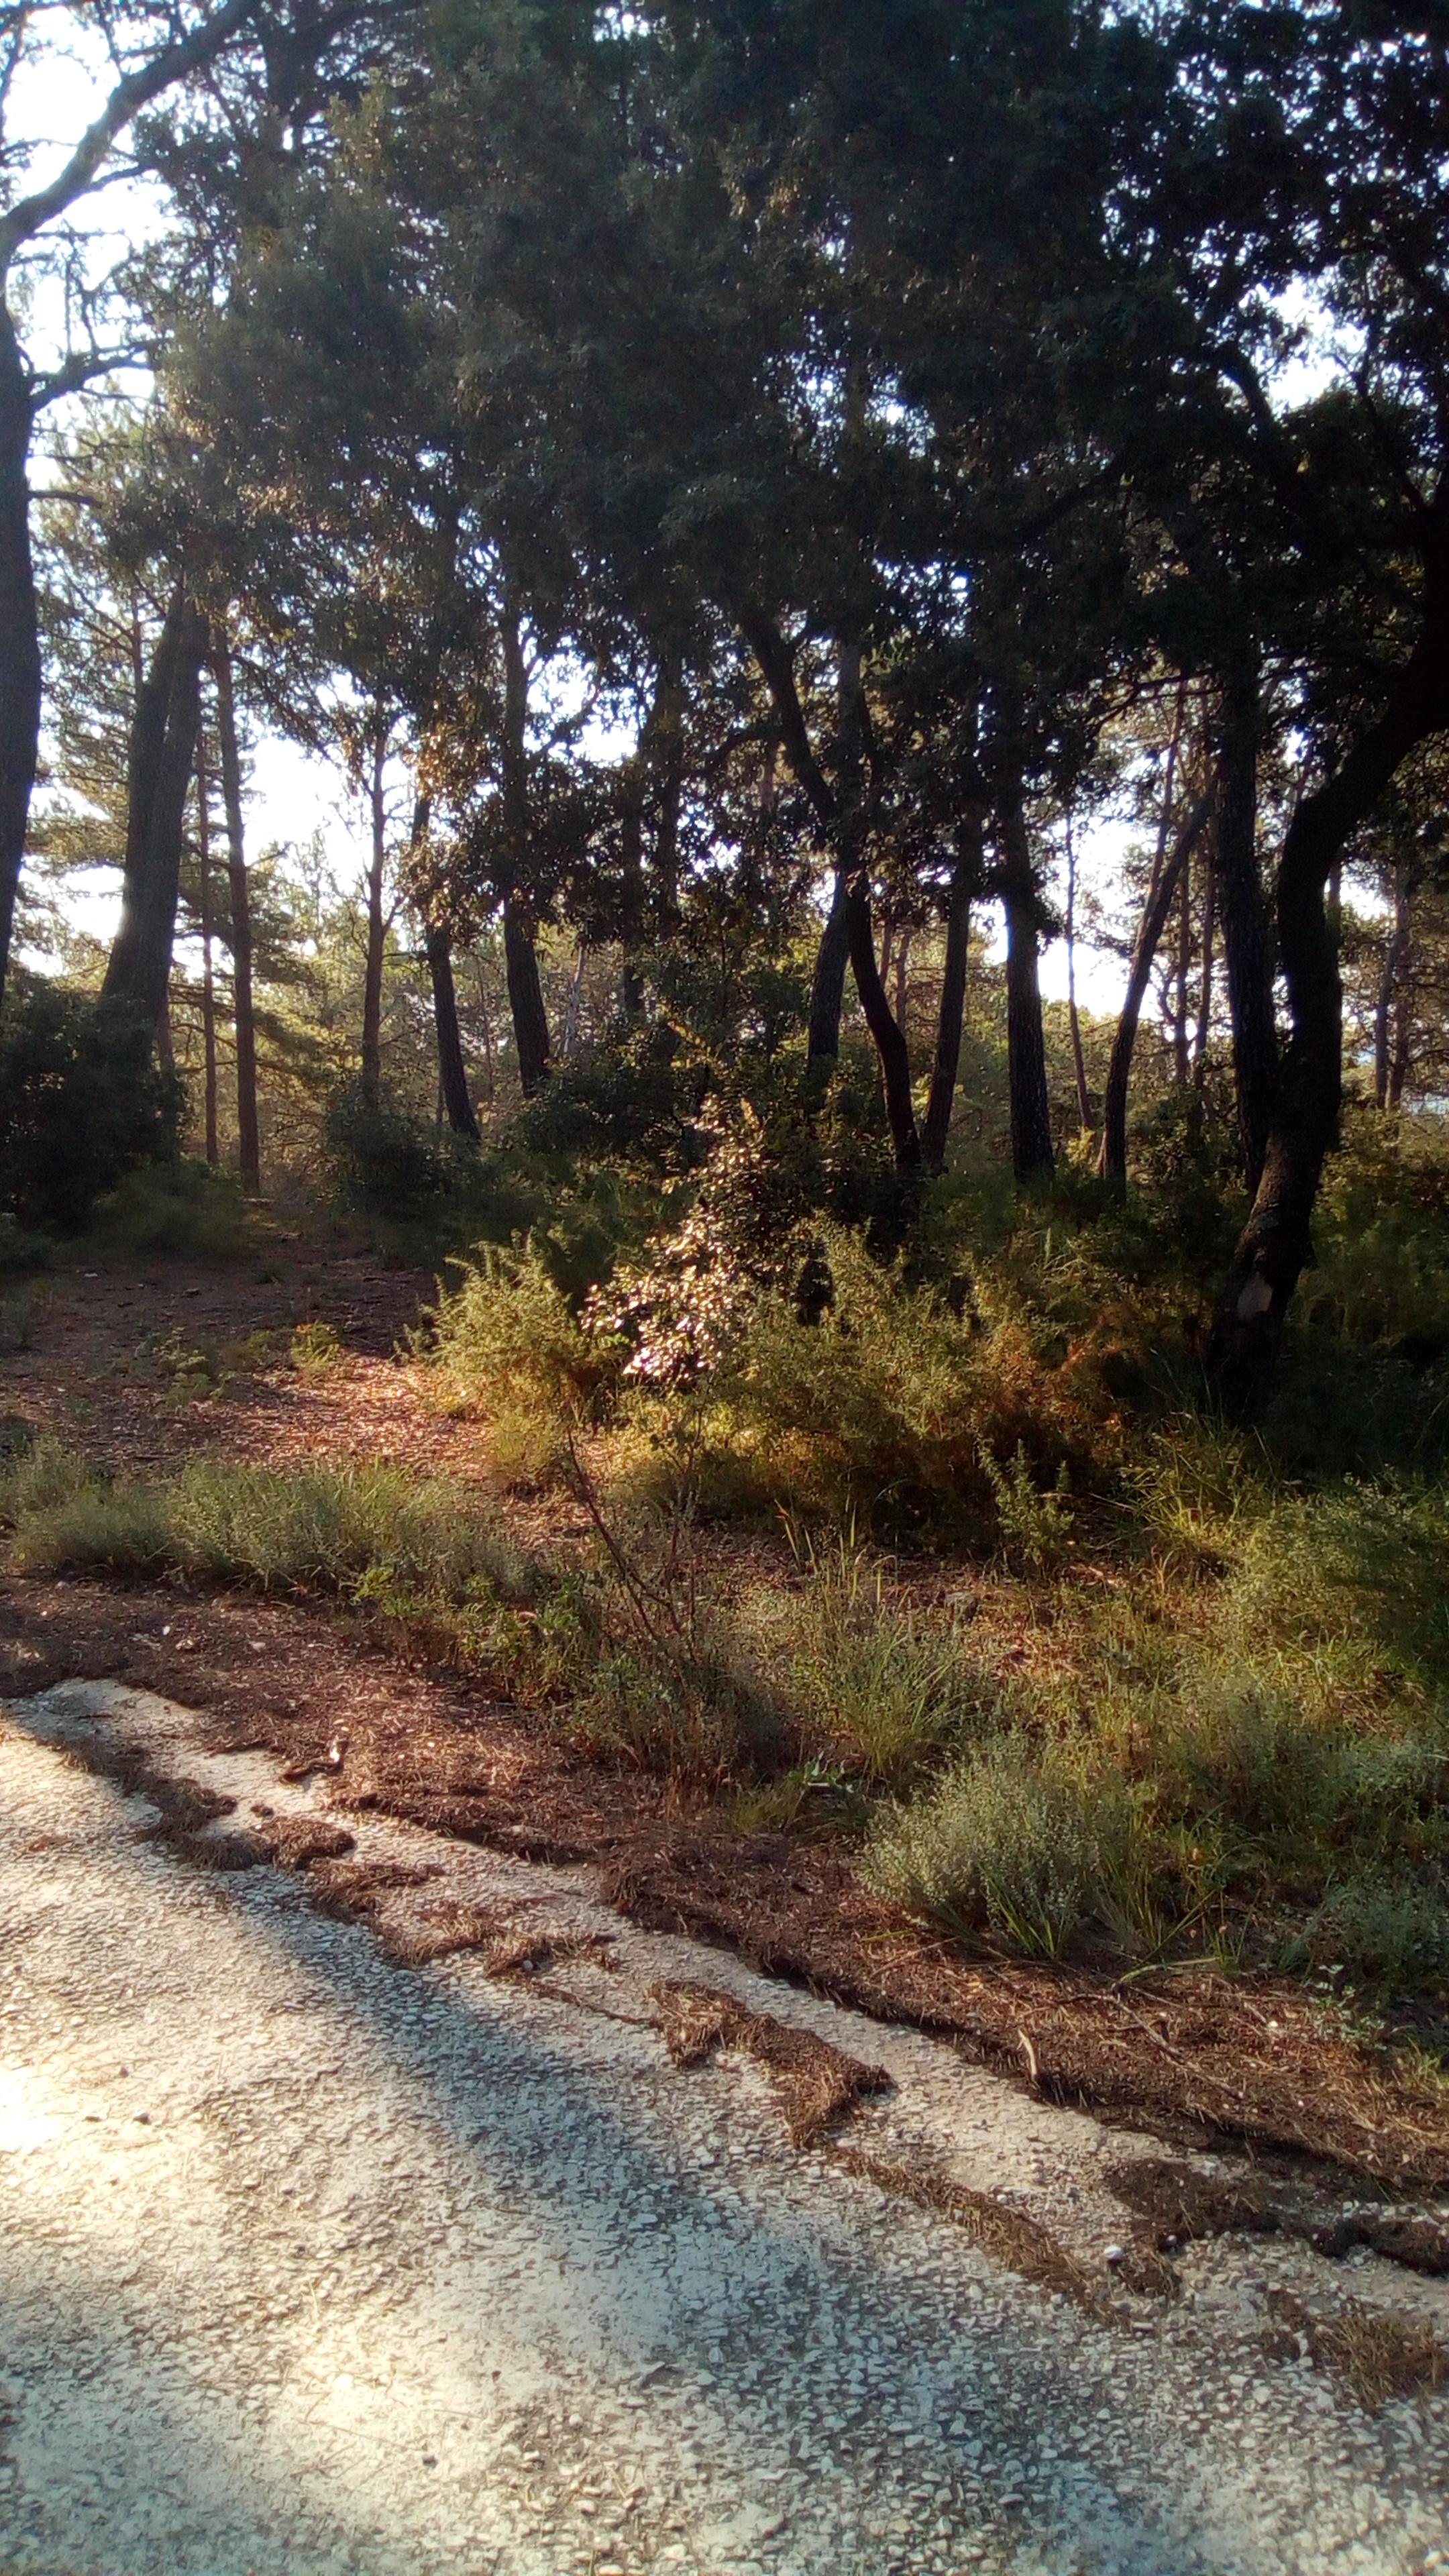 Solar urbano  Avenida bosc. Parcela en urbanización ranxos de bonany, plena naturaleza.